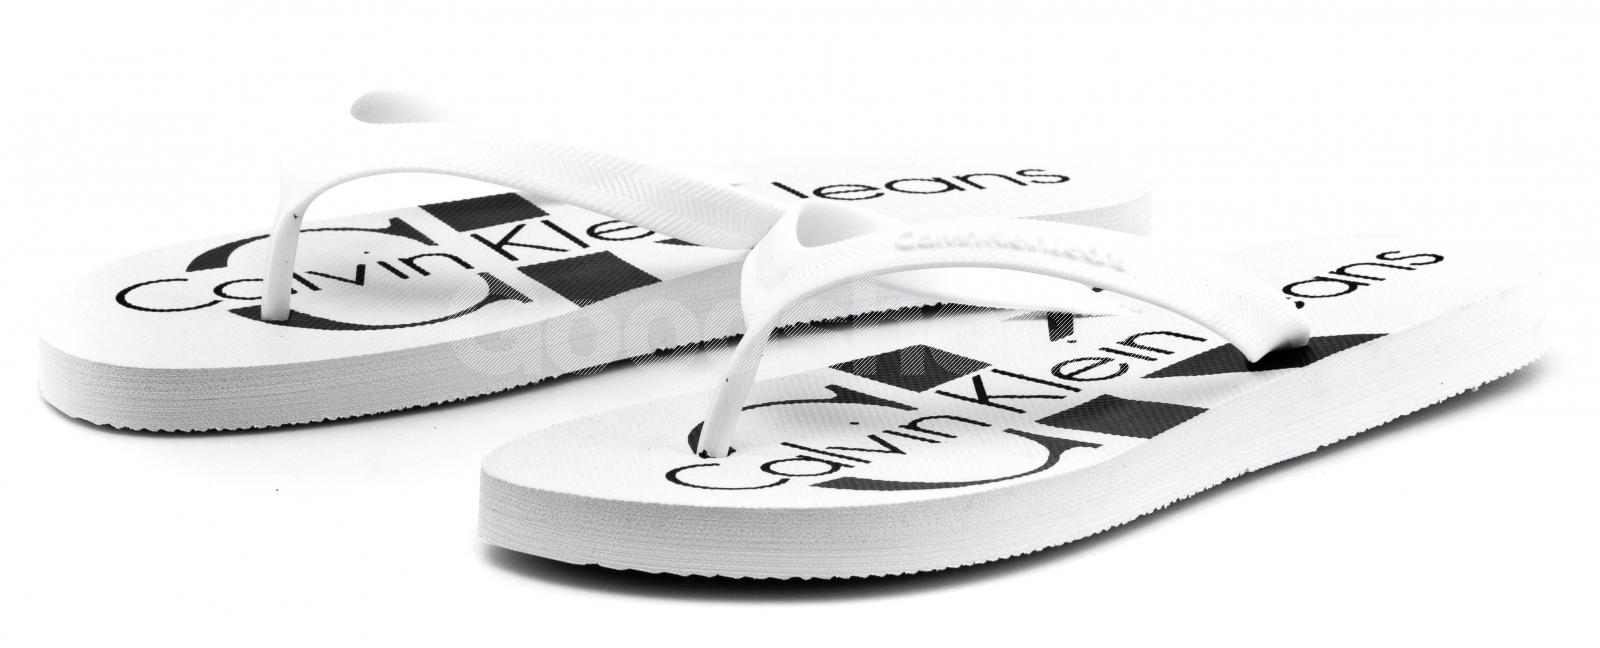 3b09689a48727 Japonki Męskie Calvin Klein Jeans Białe Dash S0063 White - Goodshoes.pl